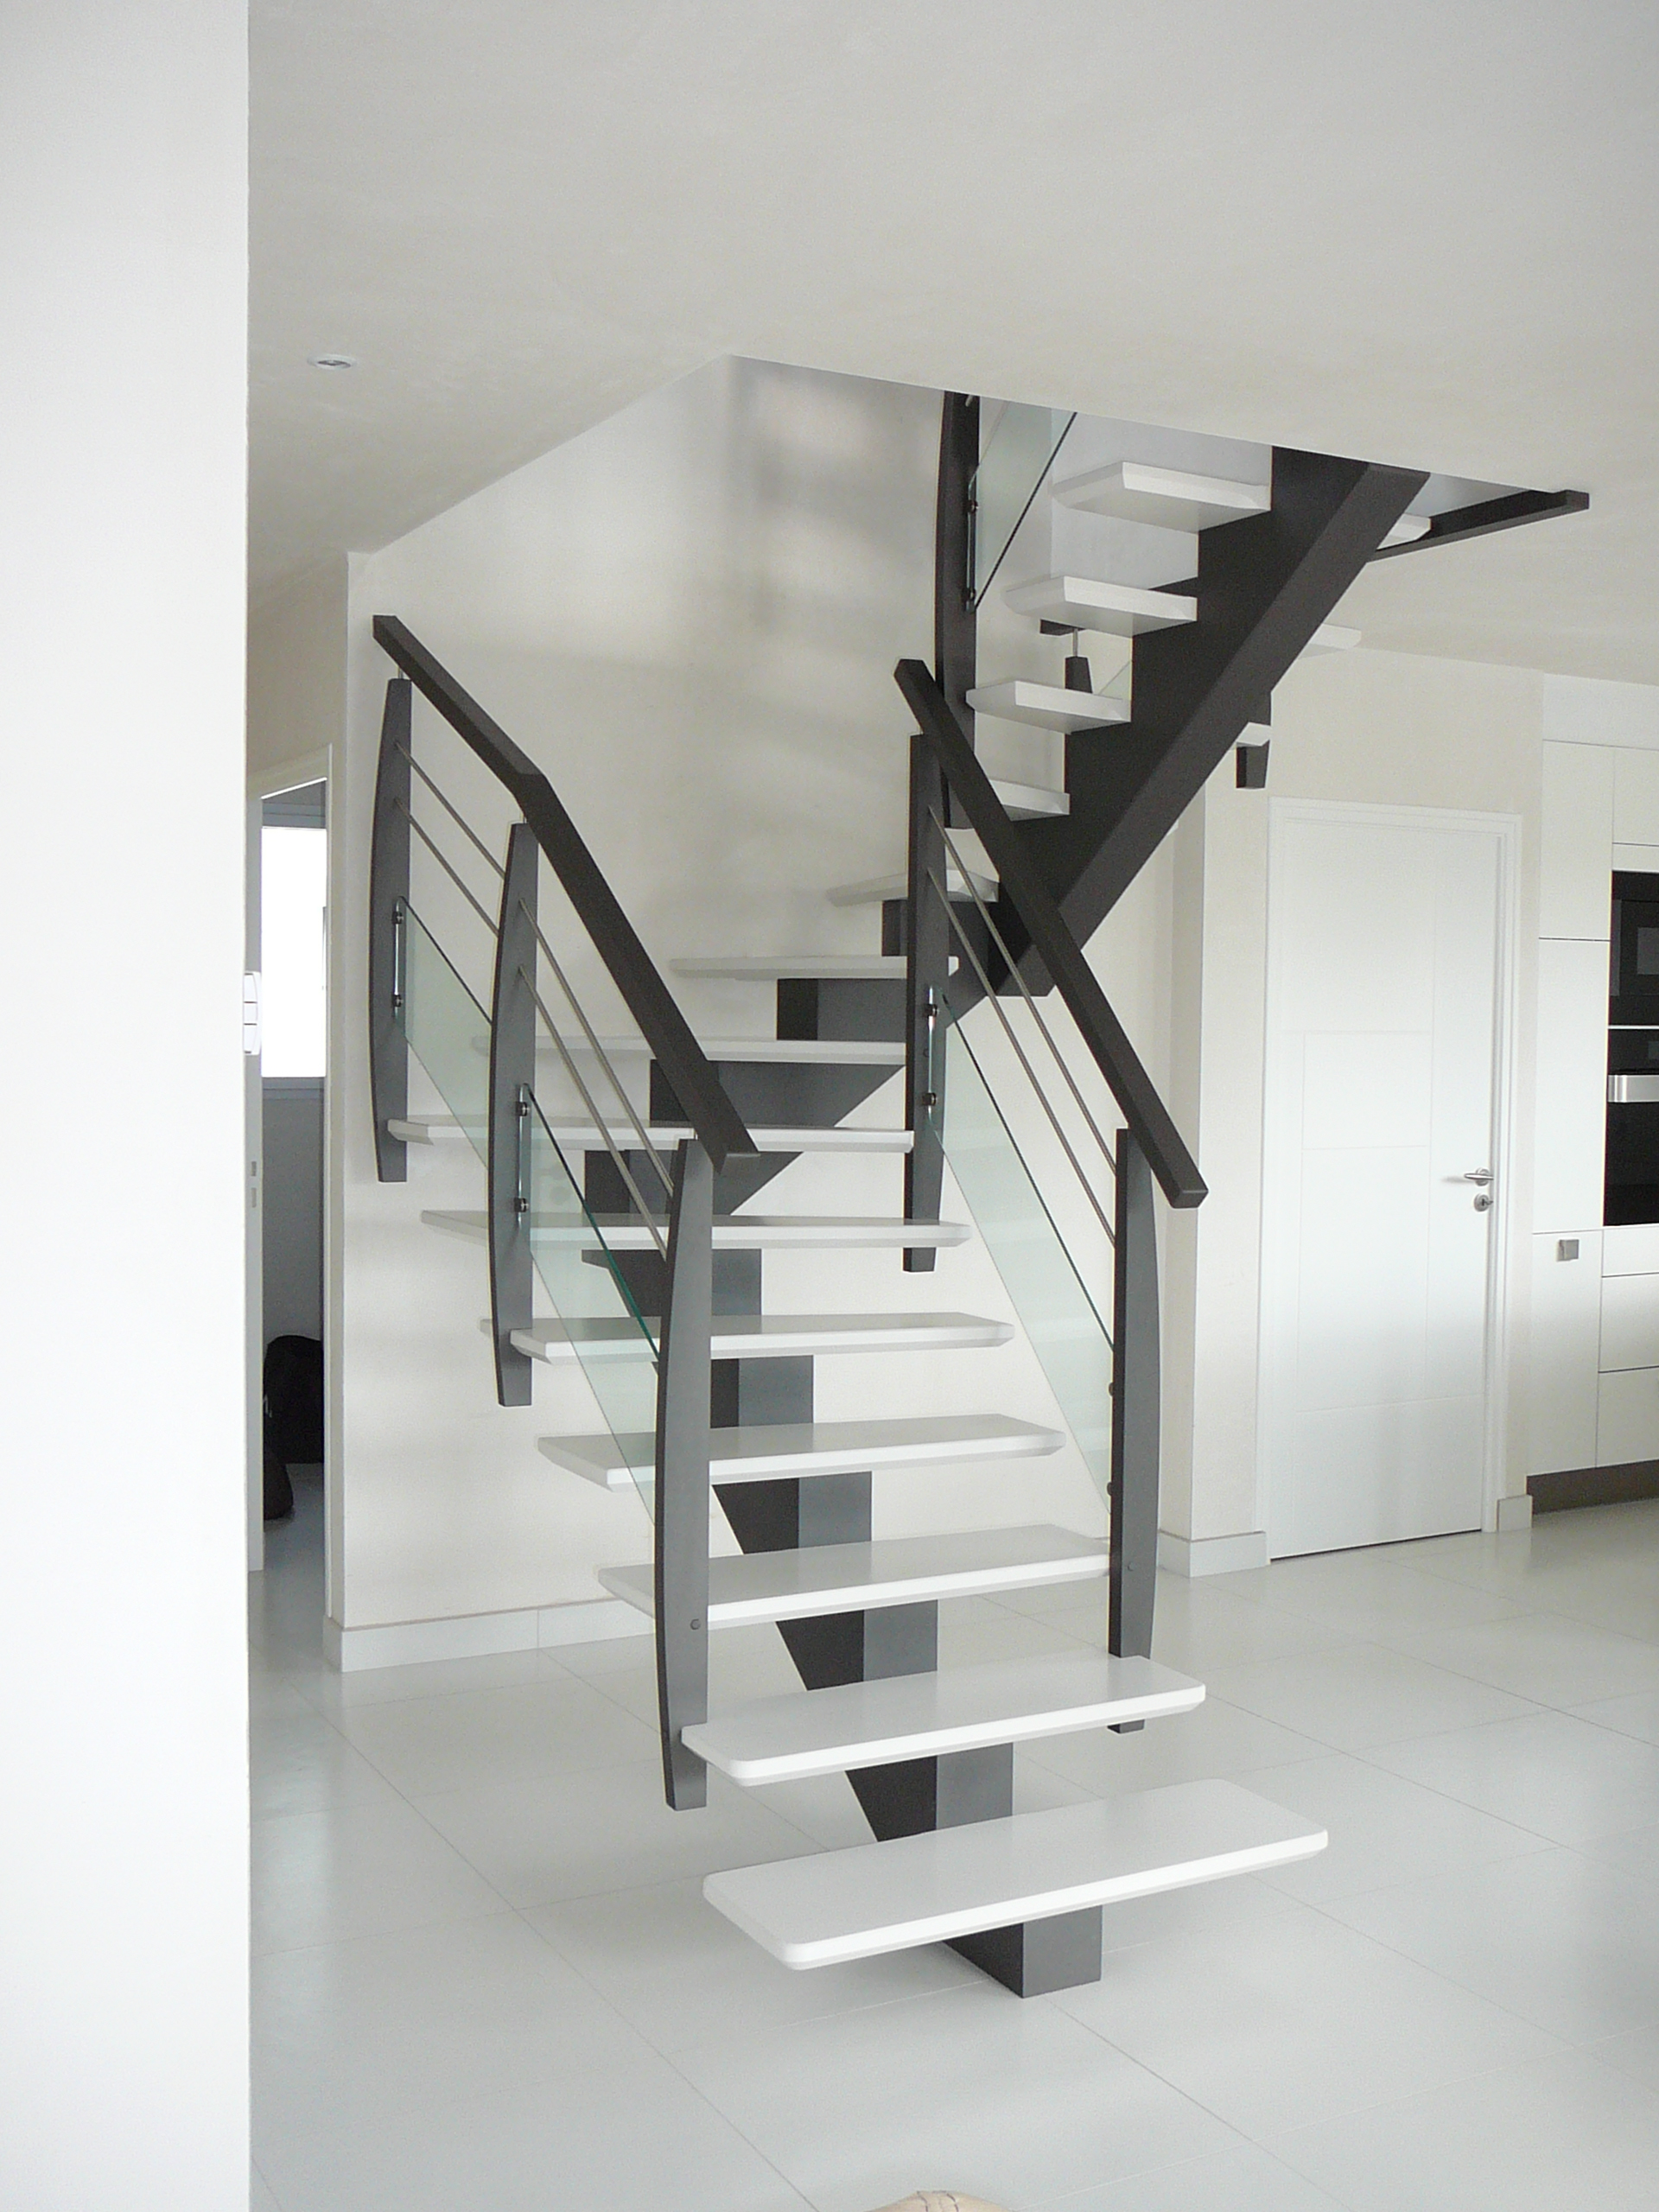 2 4 tournant atelier glotin pontchateau. Black Bedroom Furniture Sets. Home Design Ideas